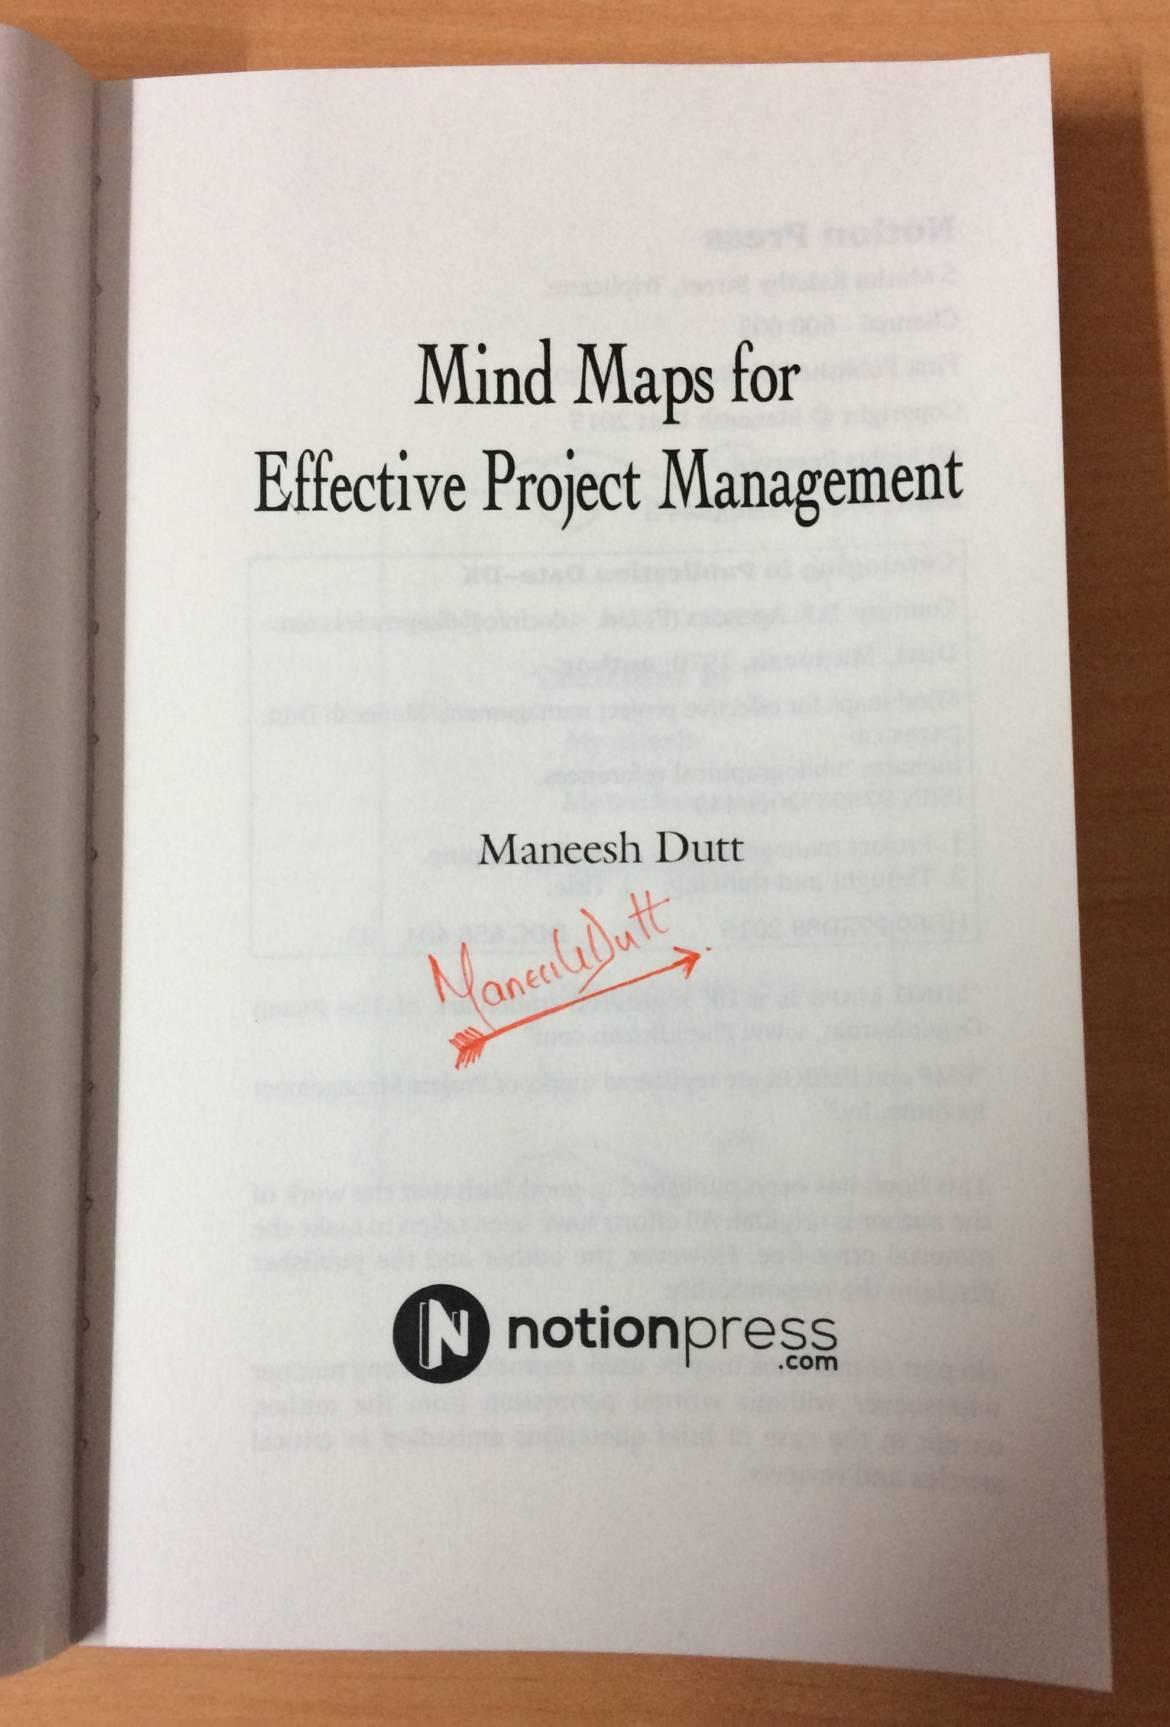 Signed_MMfEPM-1.jpg